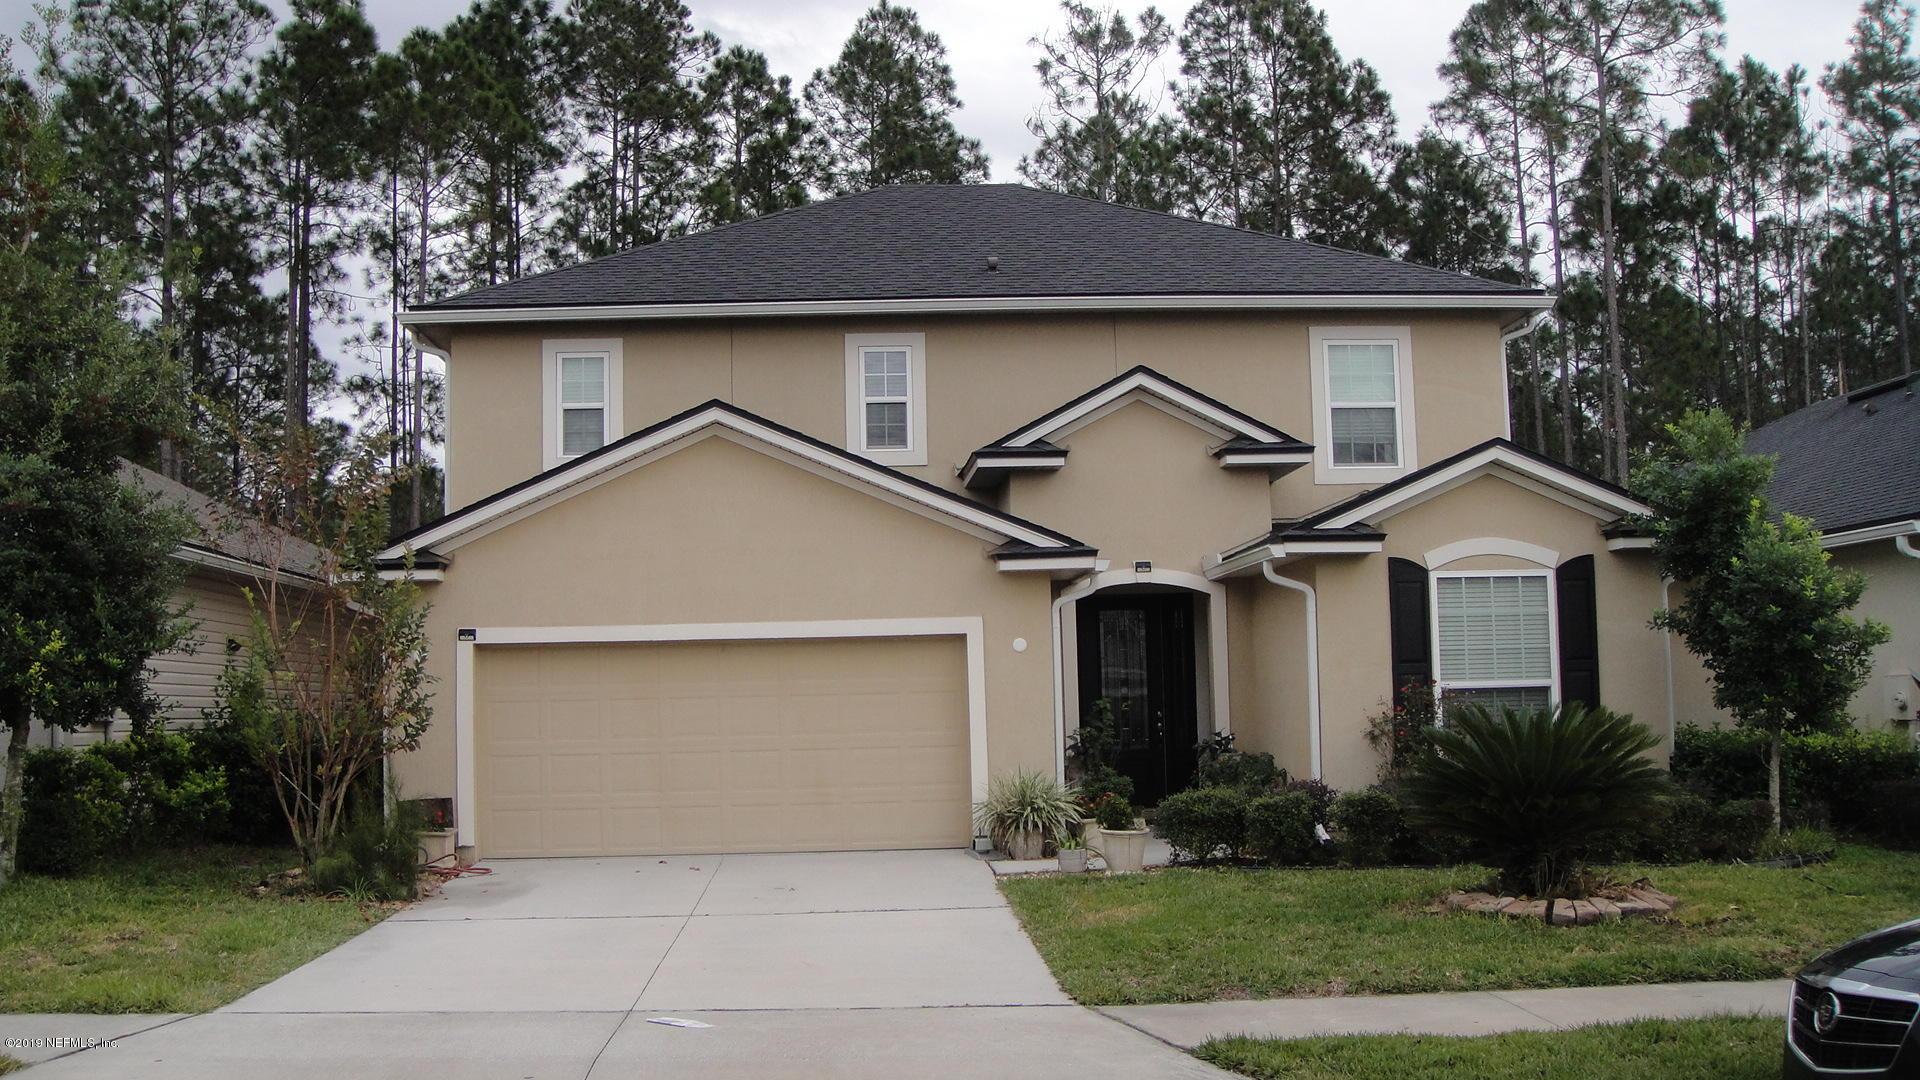 496 GLENDALE, ORANGE PARK, FLORIDA 32065, 4 Bedrooms Bedrooms, ,2 BathroomsBathrooms,Residential - single family,For sale,GLENDALE,974694